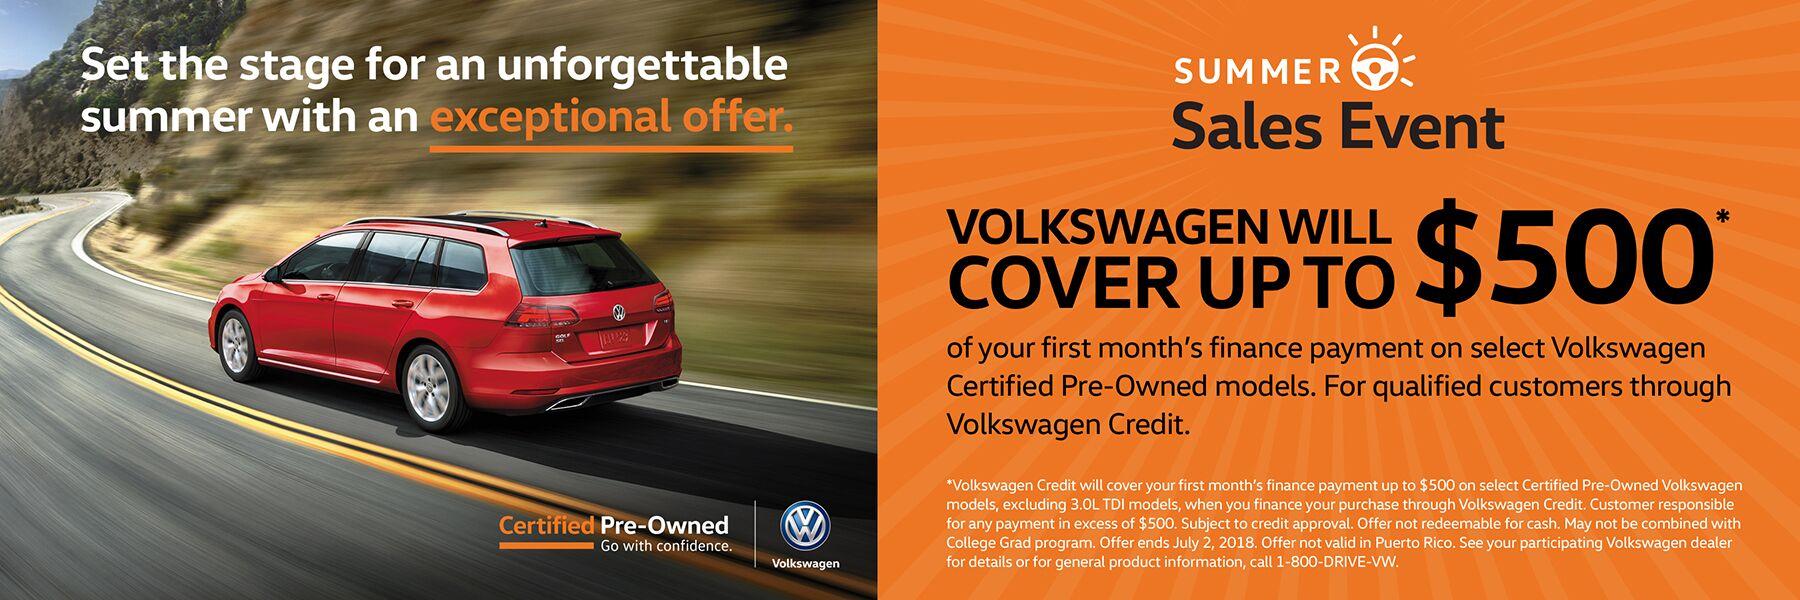 Volkswagen Certified Pre-Owned in Elgin, IL